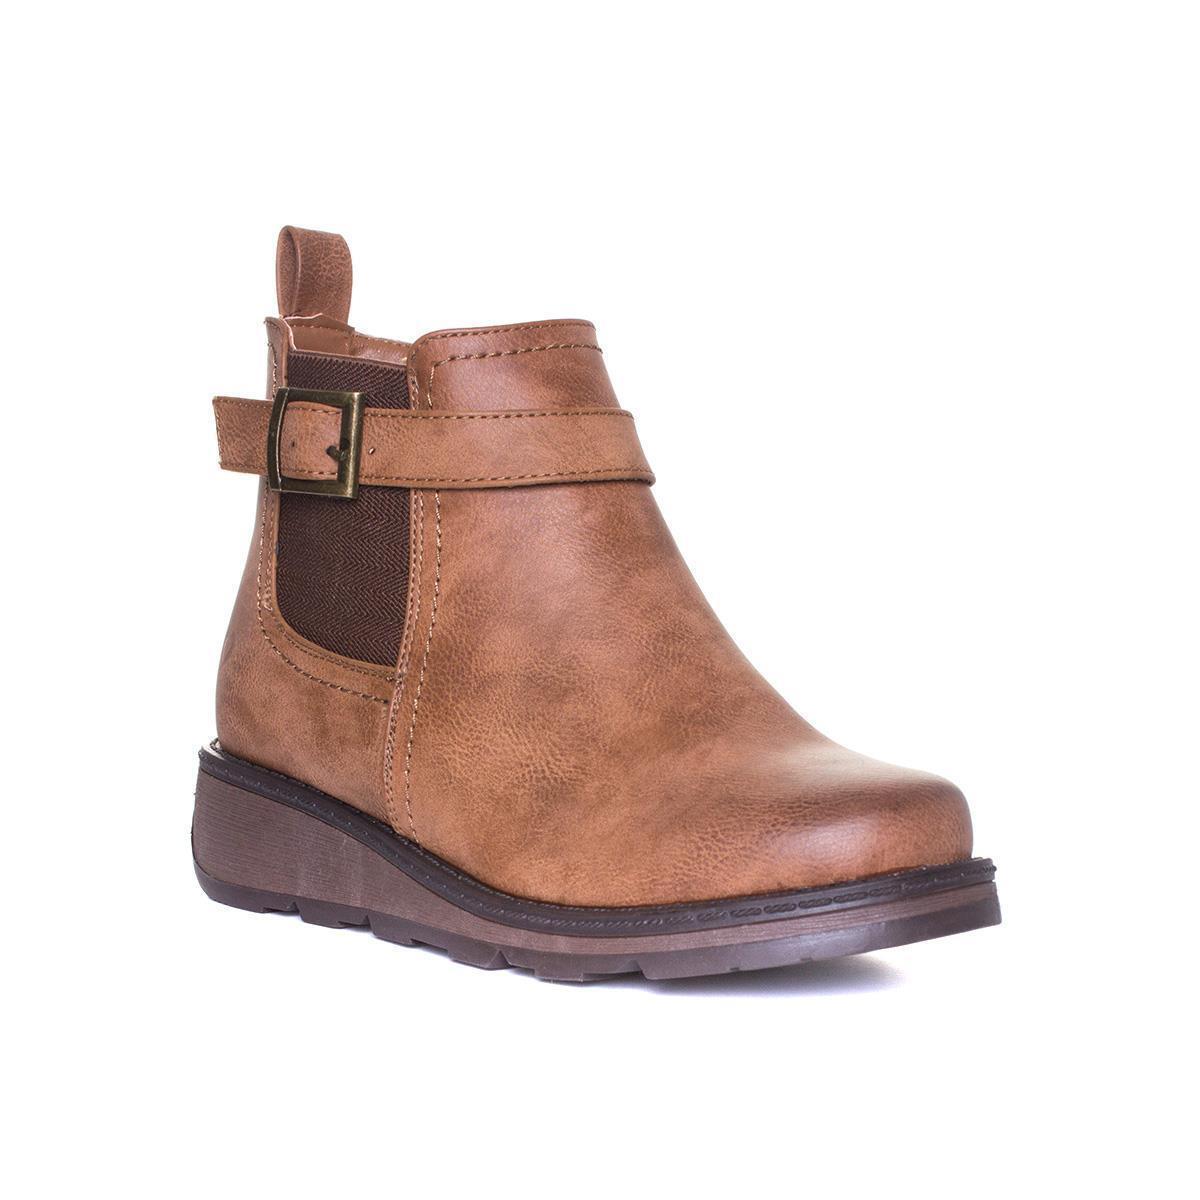 Heavenly Feet Womens Tan Wedge Boot - Sizes 3,4,5,6,7,8